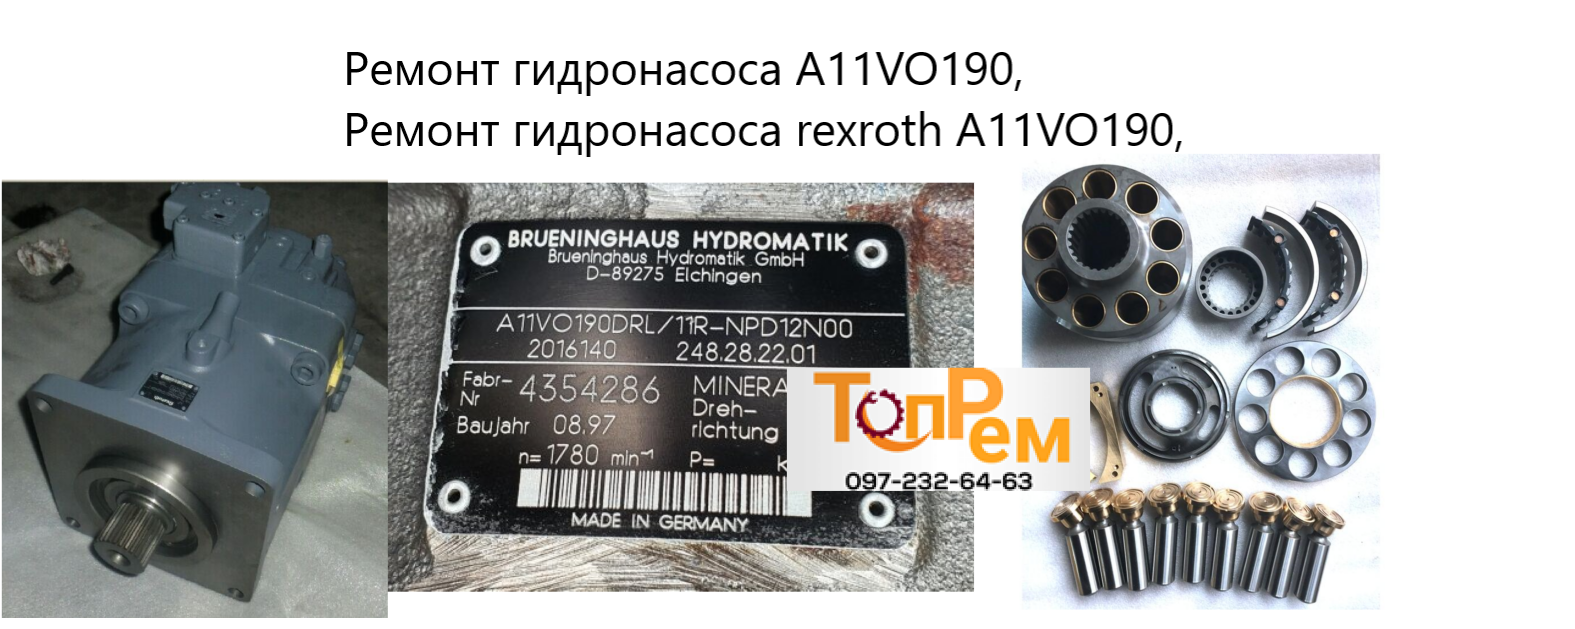 Ремонт гидронасоса A11VO190